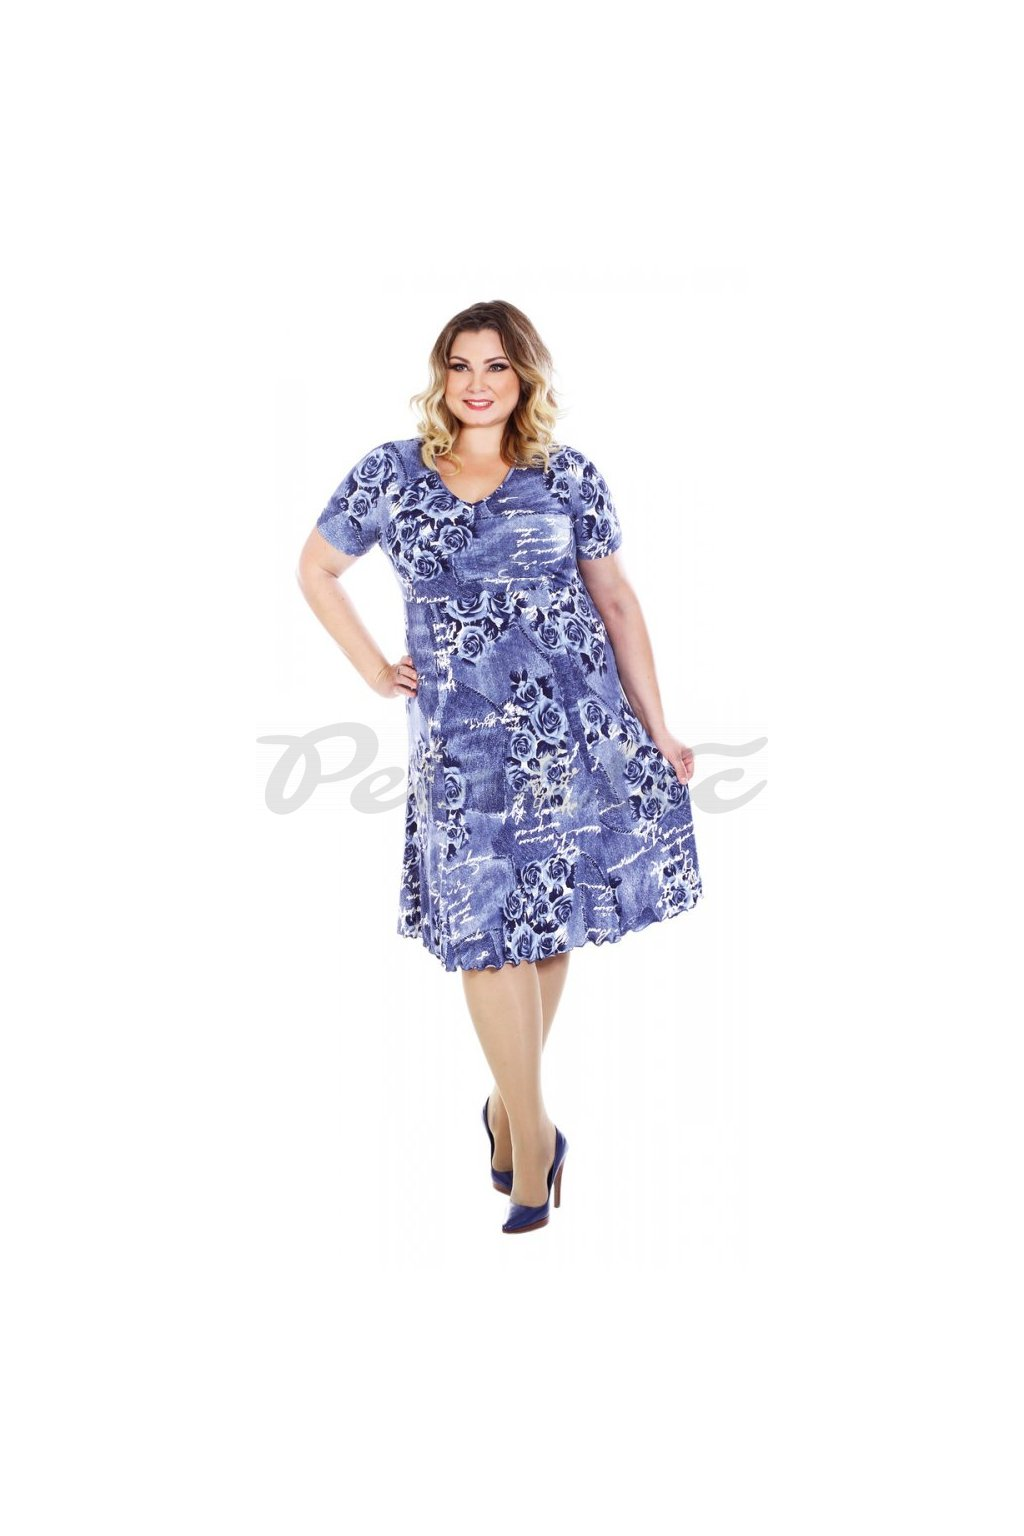 TREFA - šaty krátký rukáv 110 - 115 cm